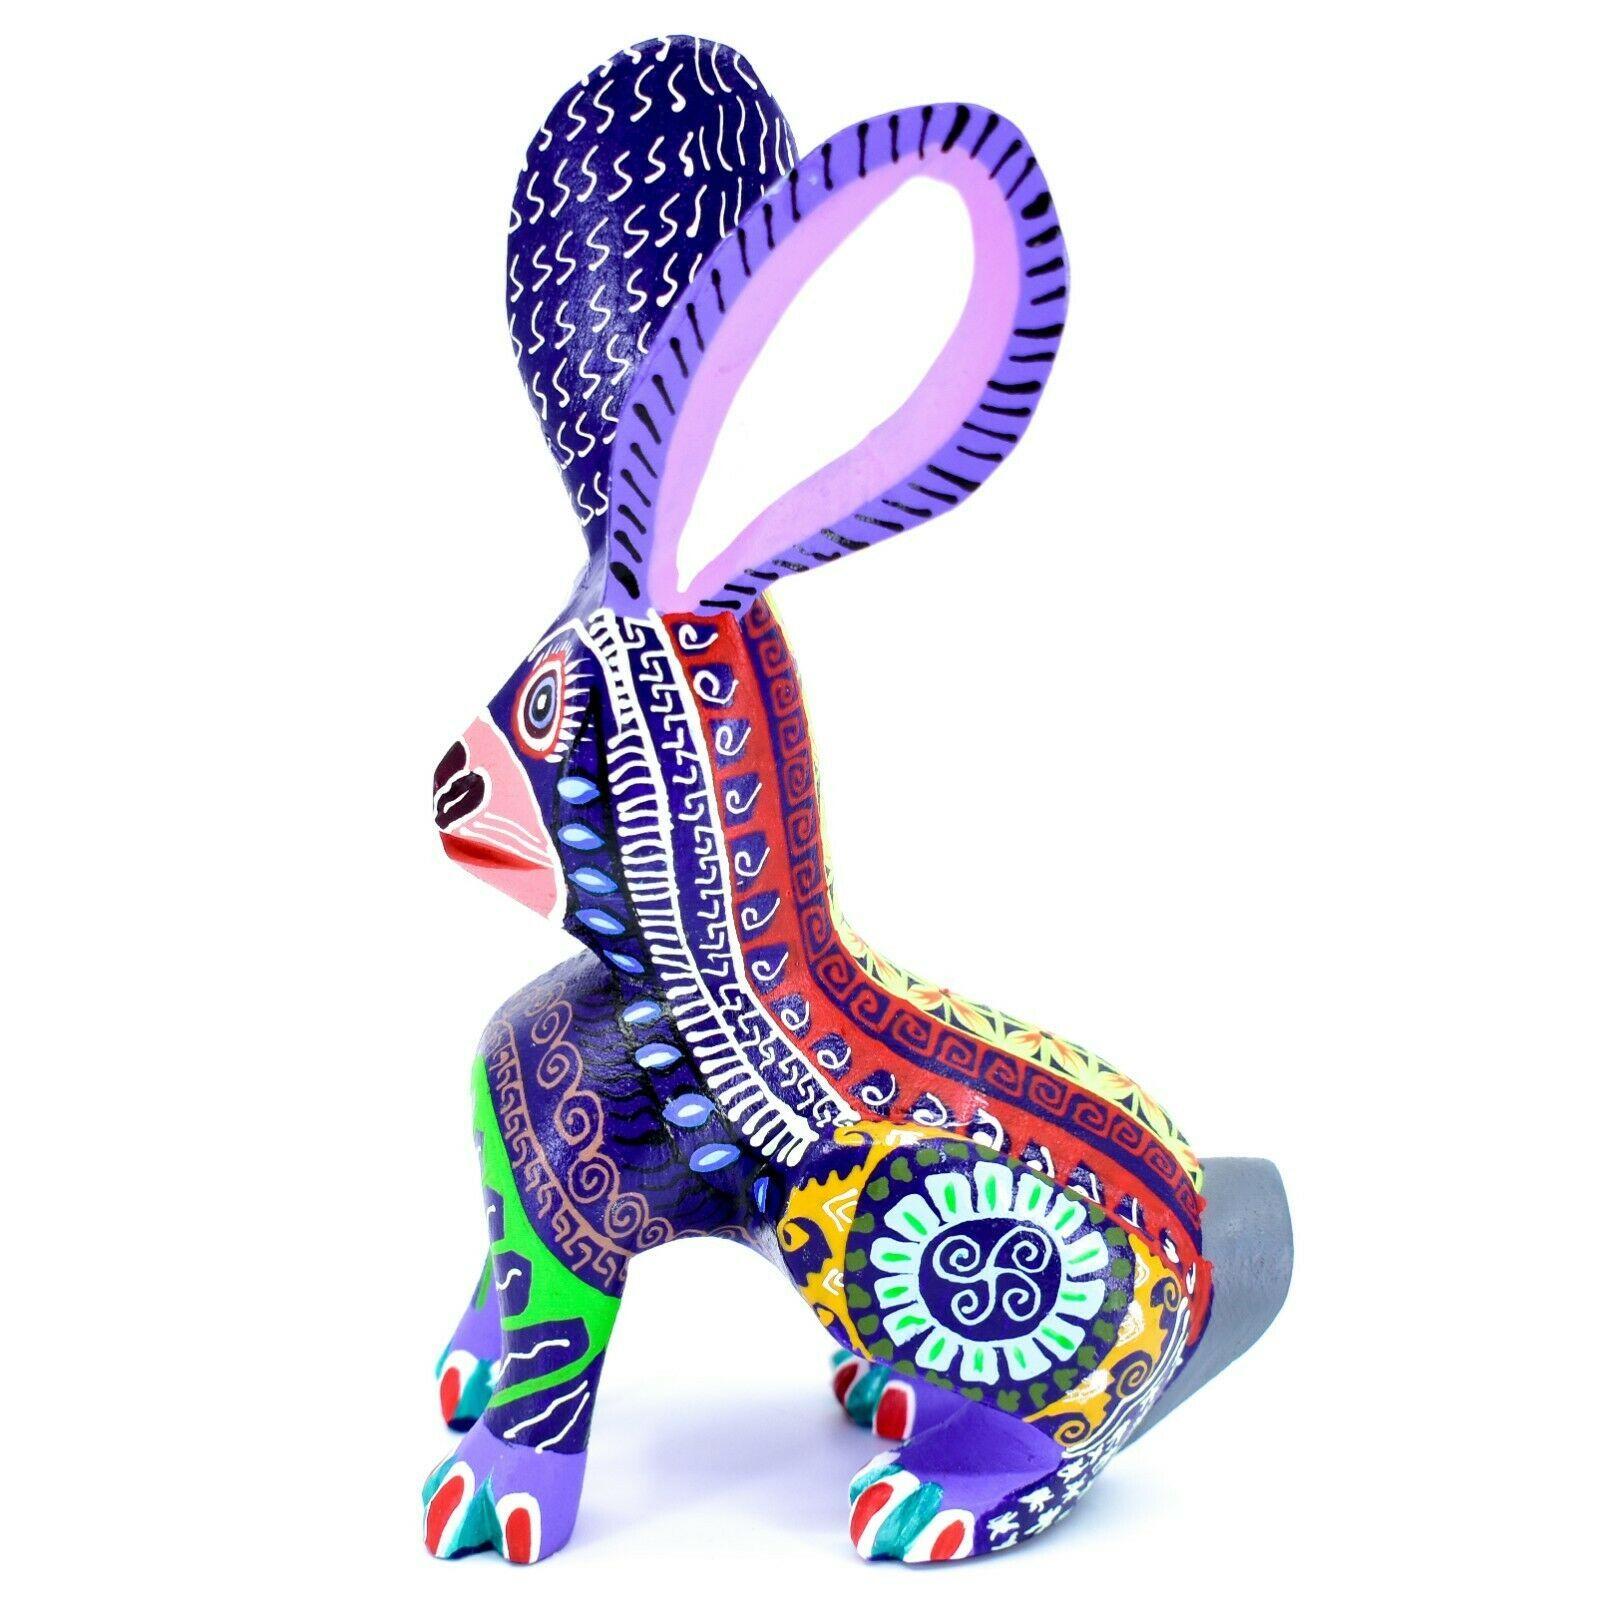 Handmade Alebrije Oaxacan Wood Carving Painted Folk Art Jackrabbit Rabbit Figure